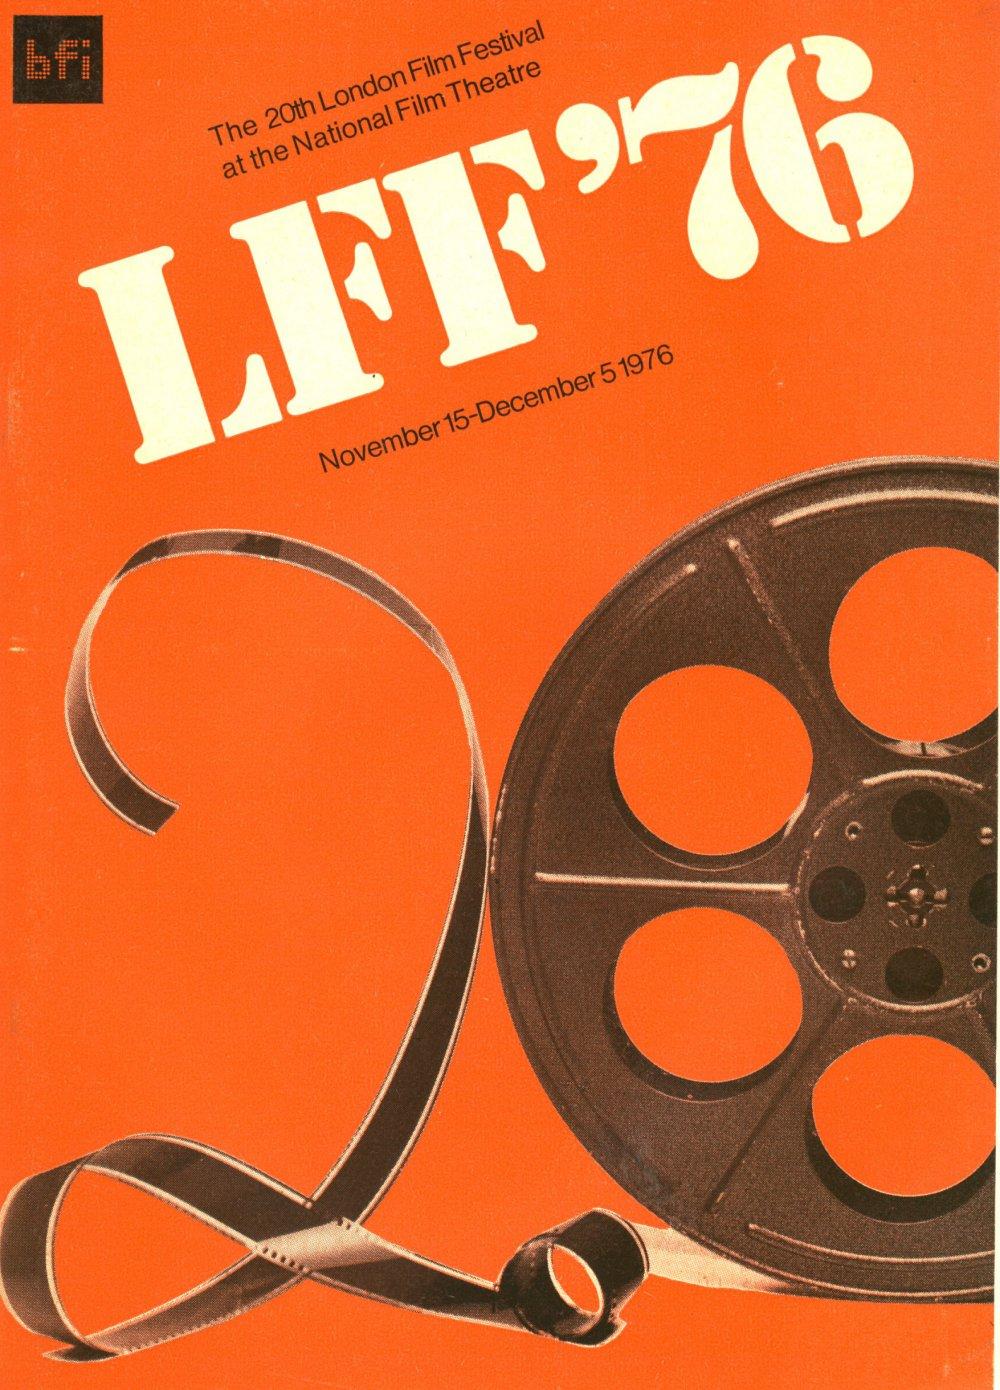 20th London Film Festival poster